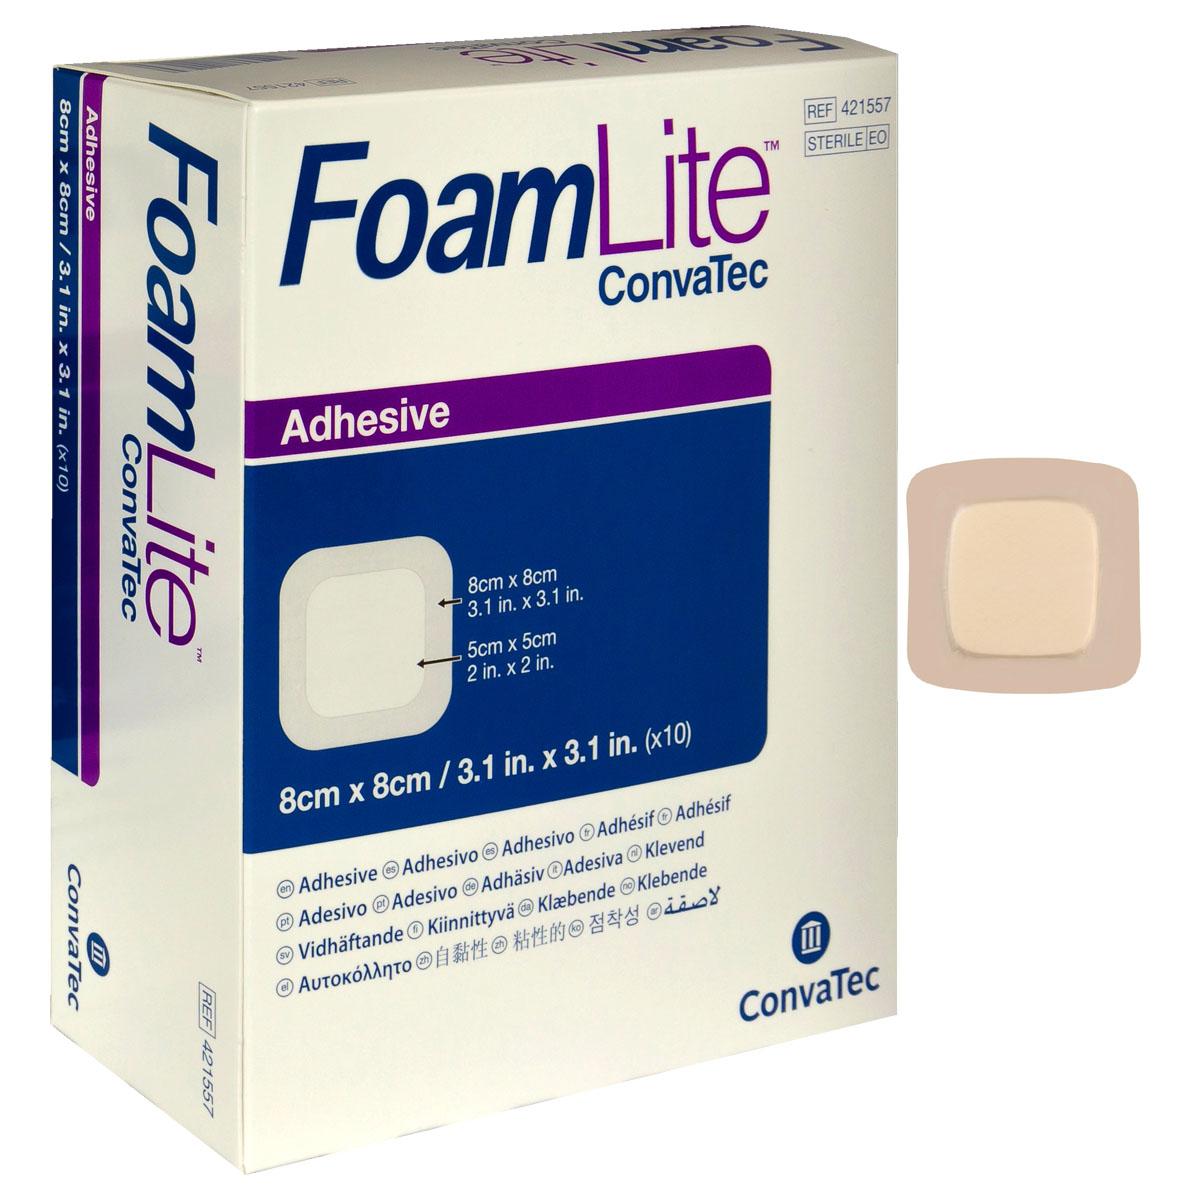 "FoamLite Foam Adhesive Dressing, Square, 3-1/4"" x 3-1/4"" 51421557"